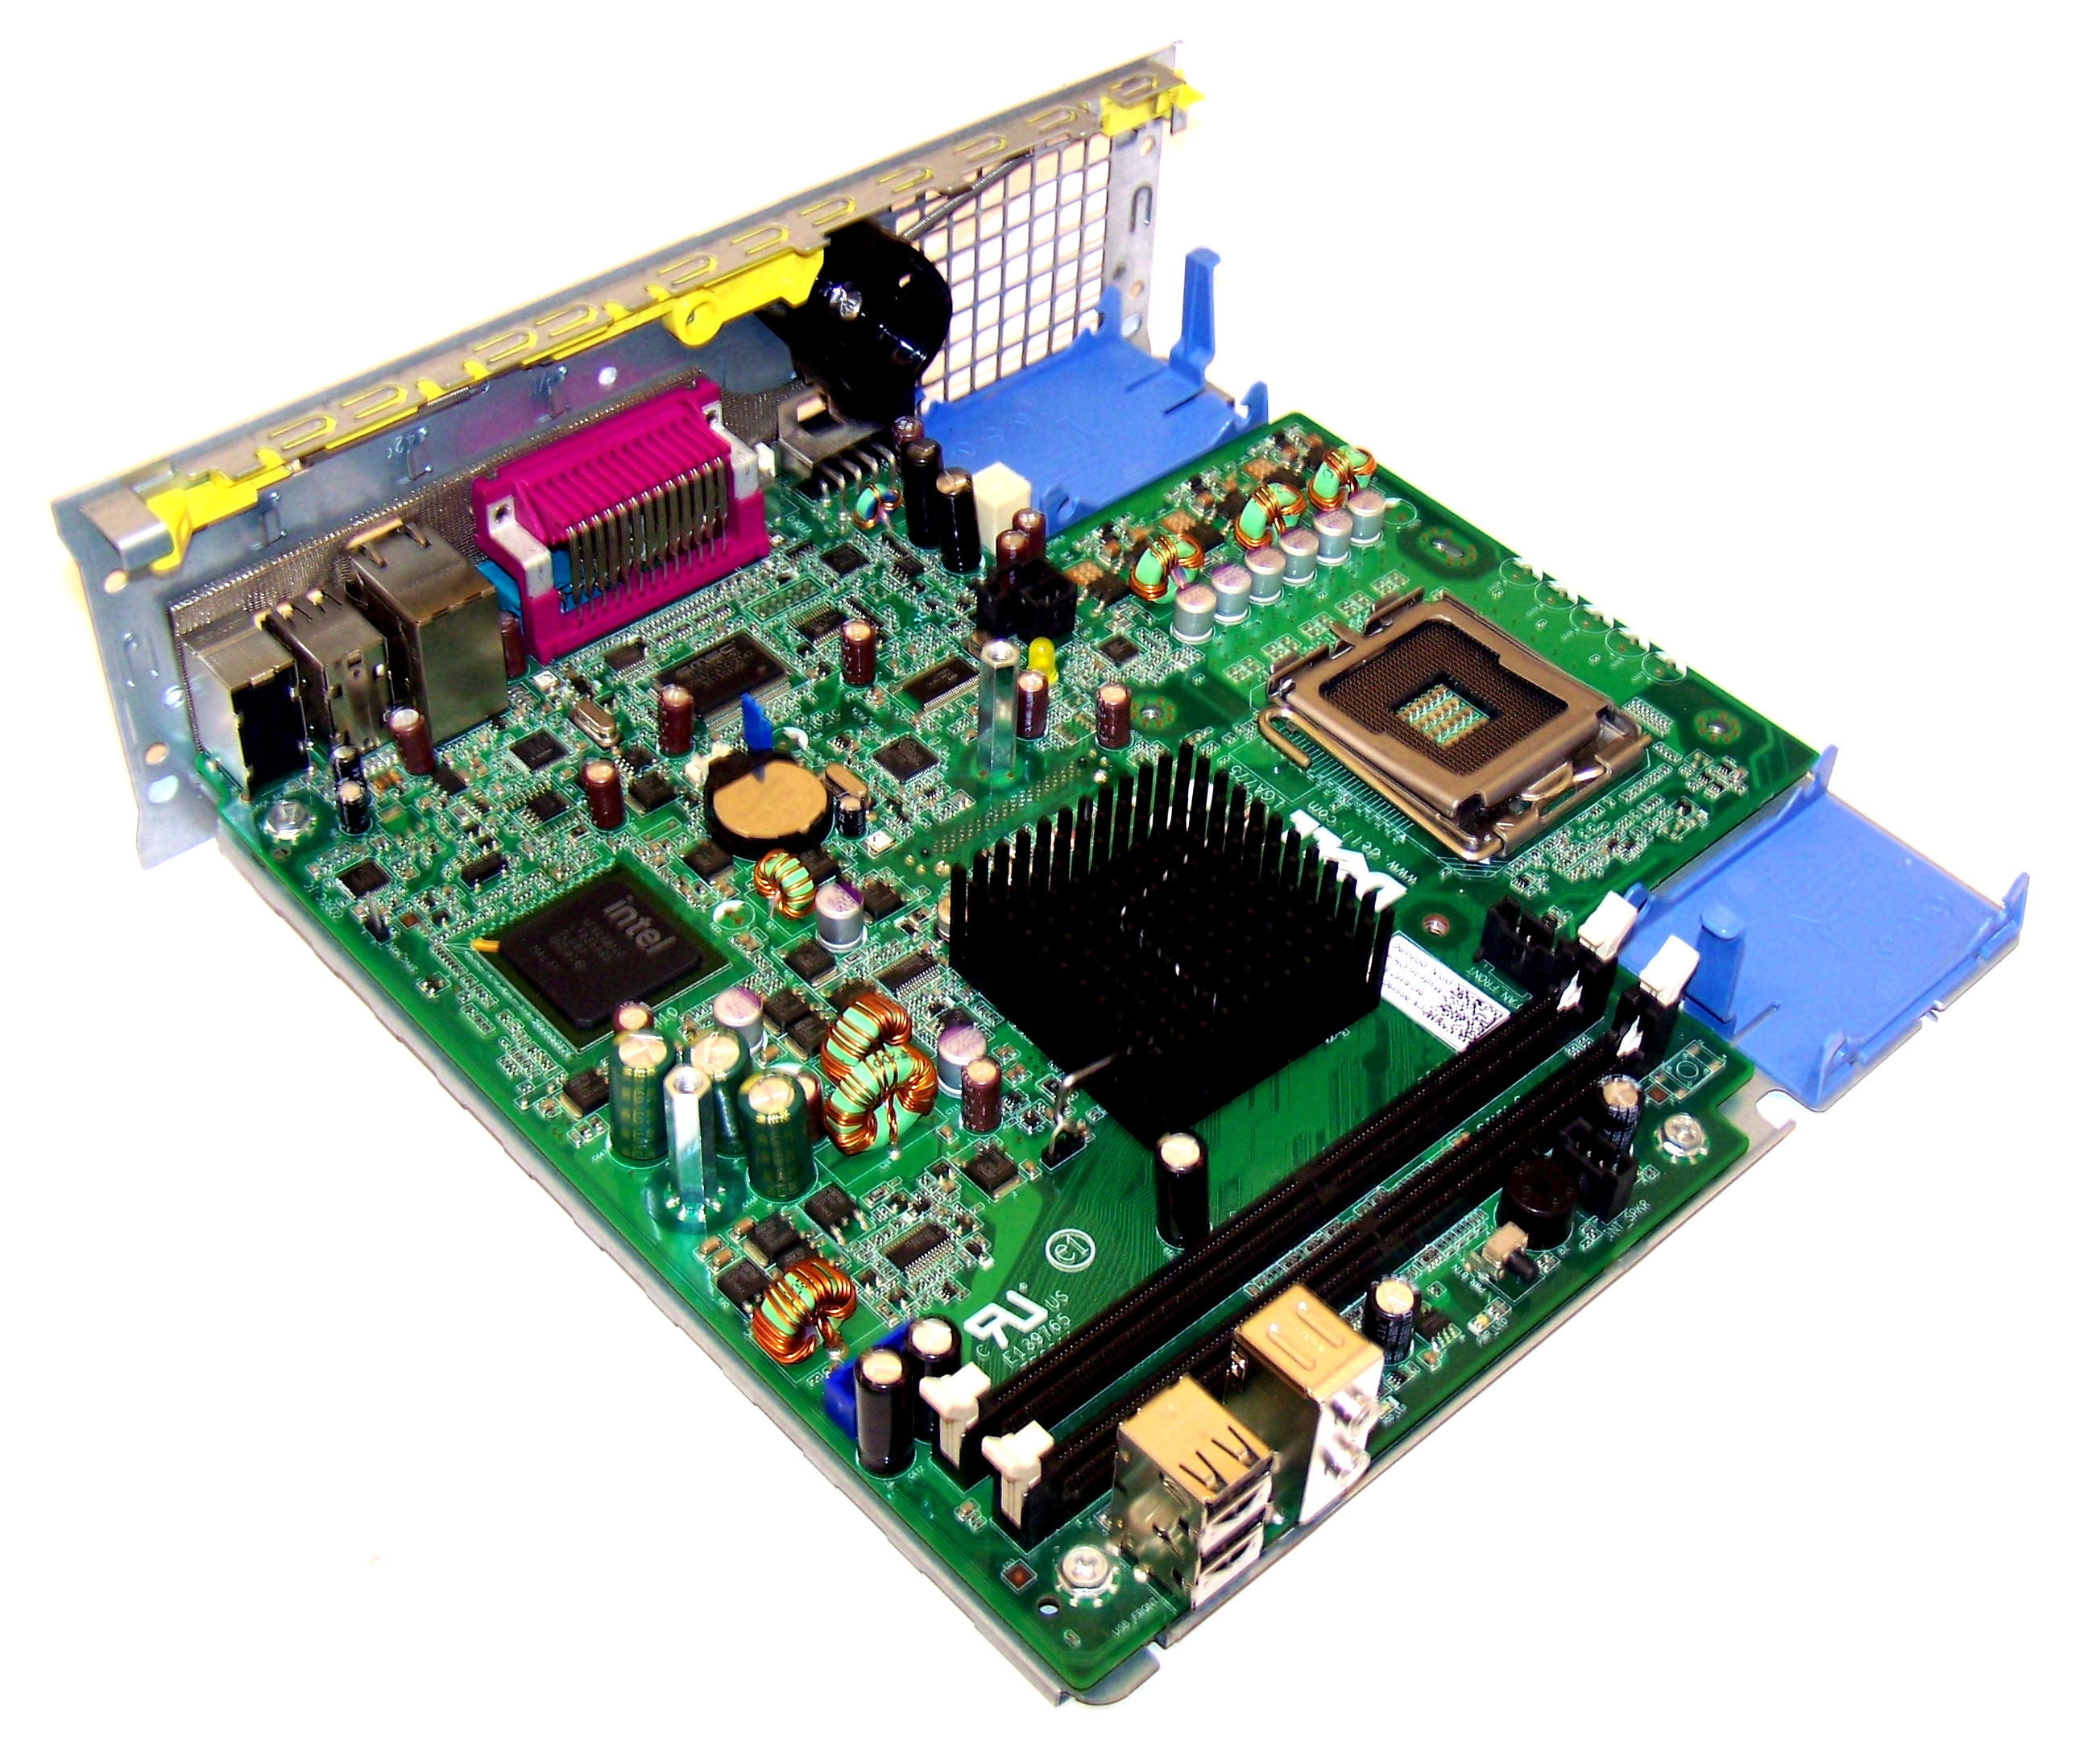 Dell G919G OptiPlex 760 USFF Socket T LGA775 Motherboard | 0G919G